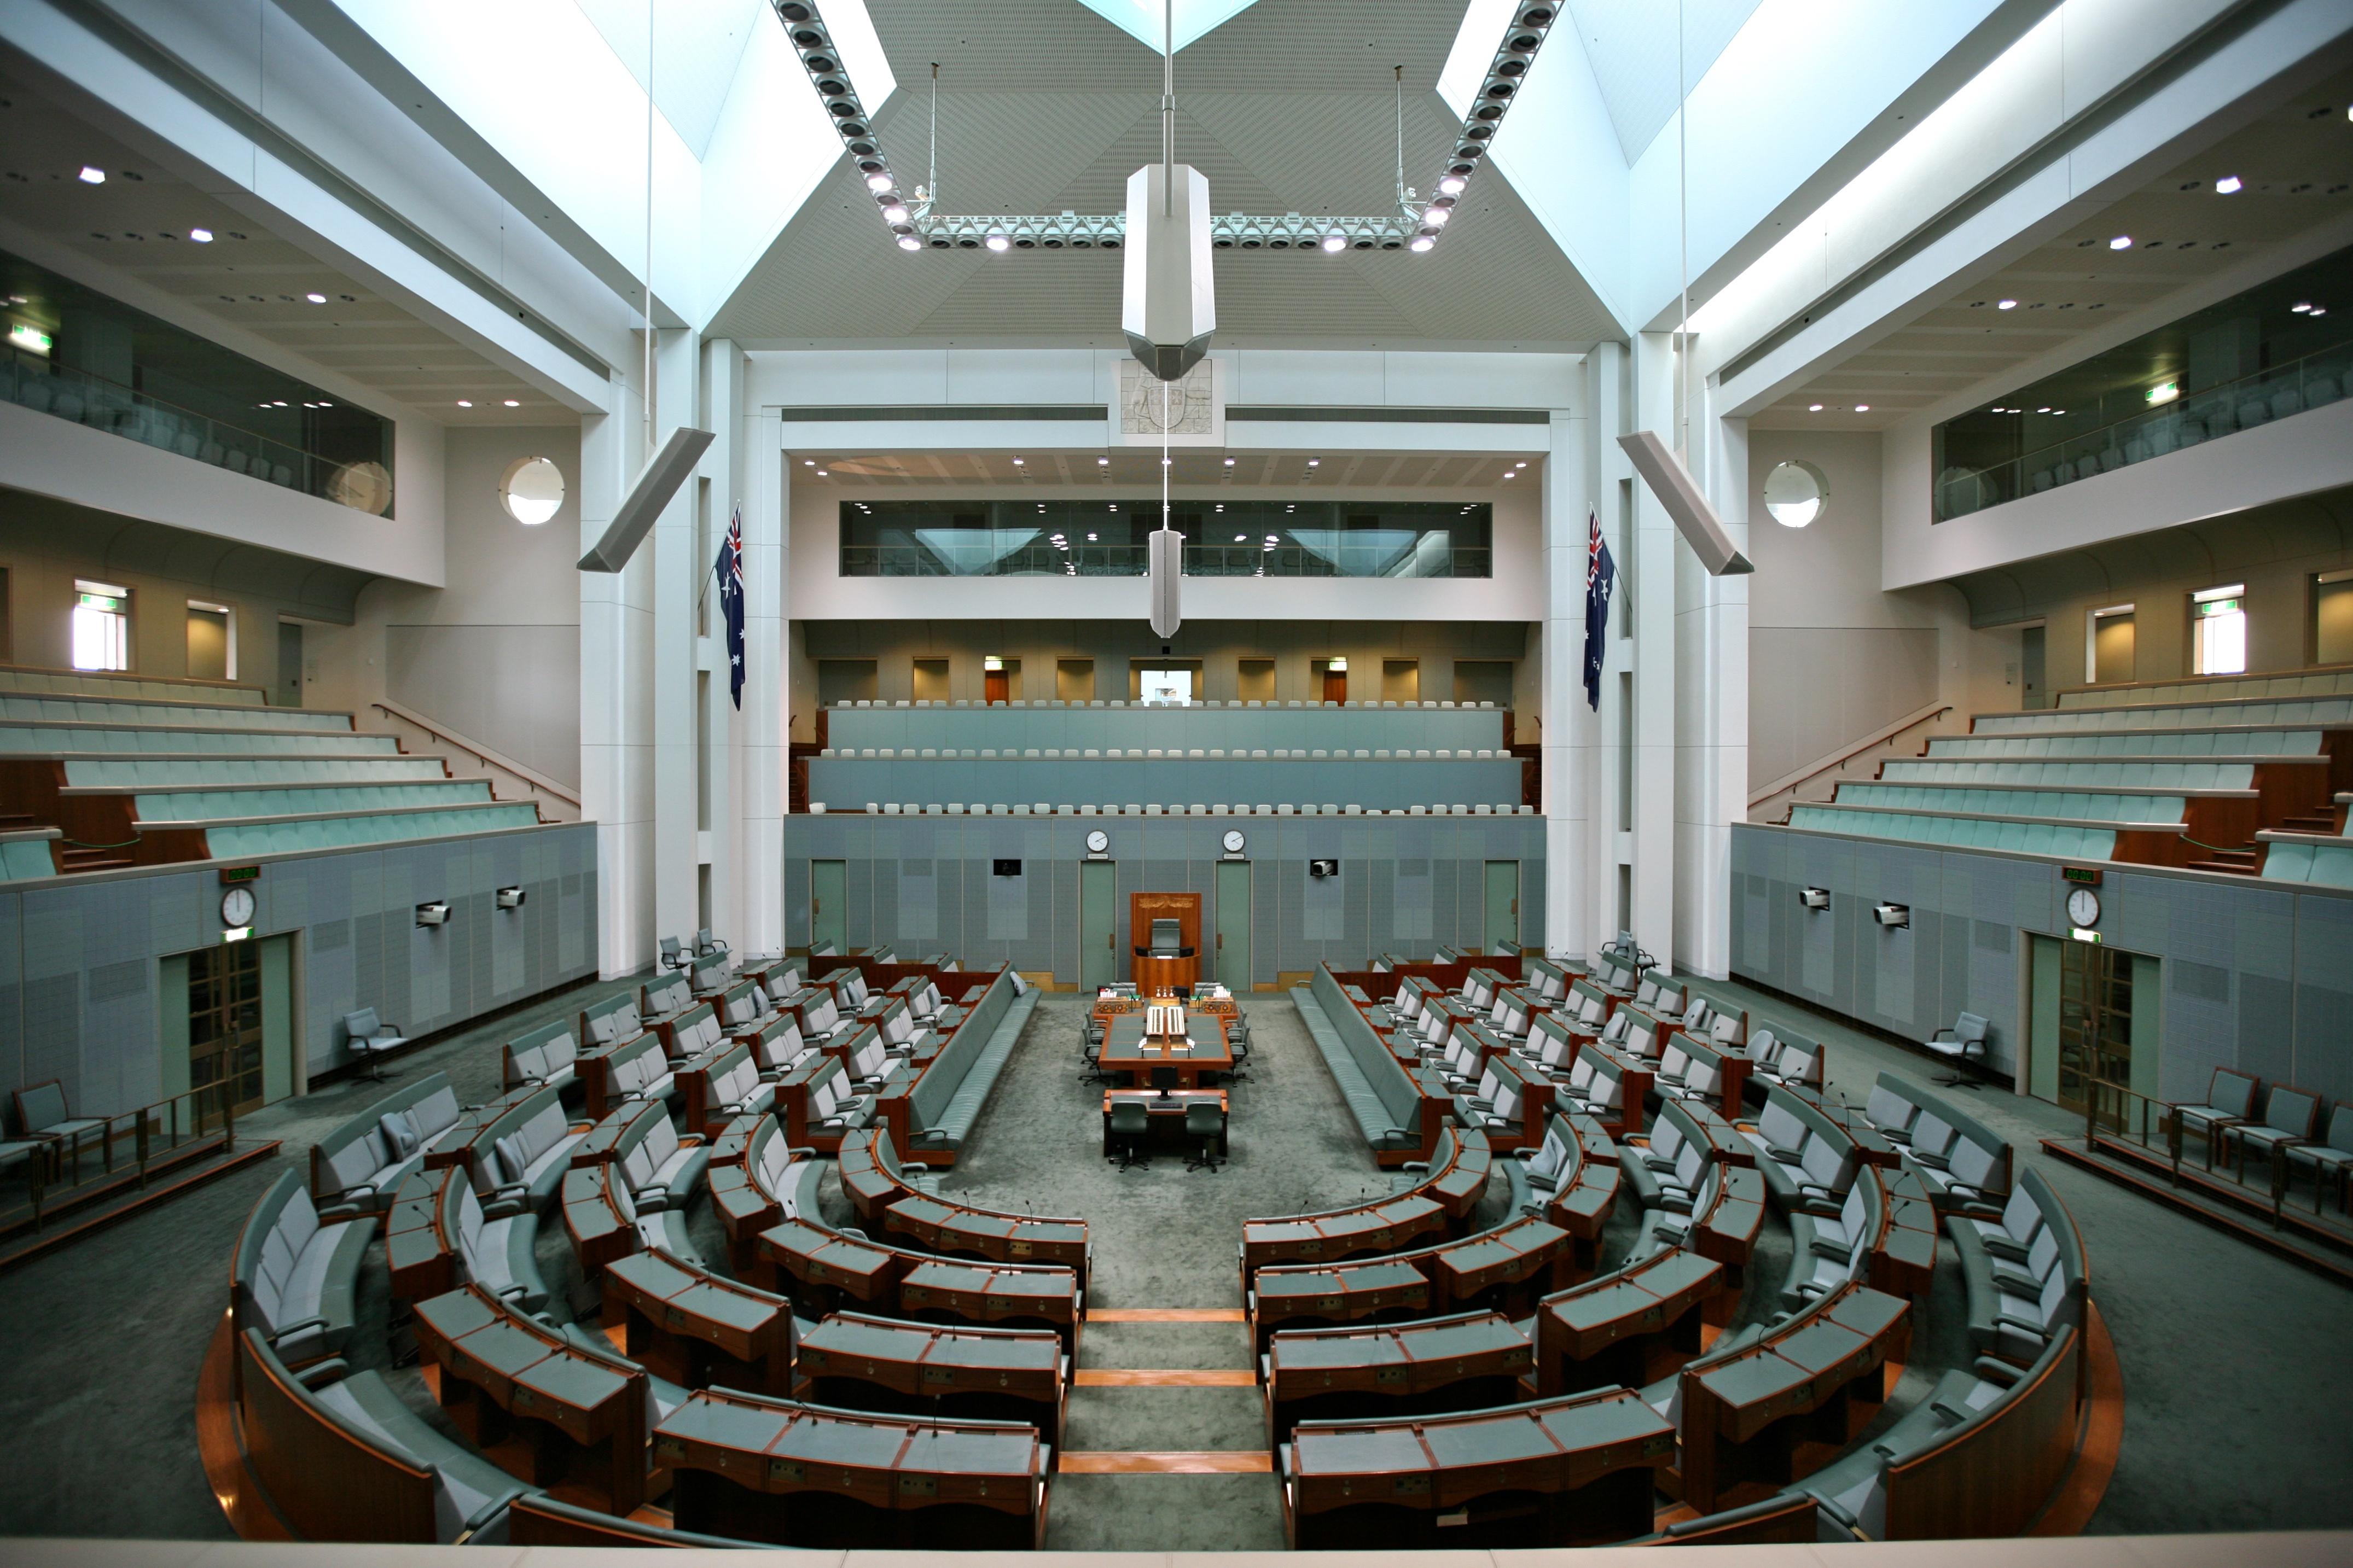 Australian House of Representatives - Canberra | Flickr ... House Of Representatives